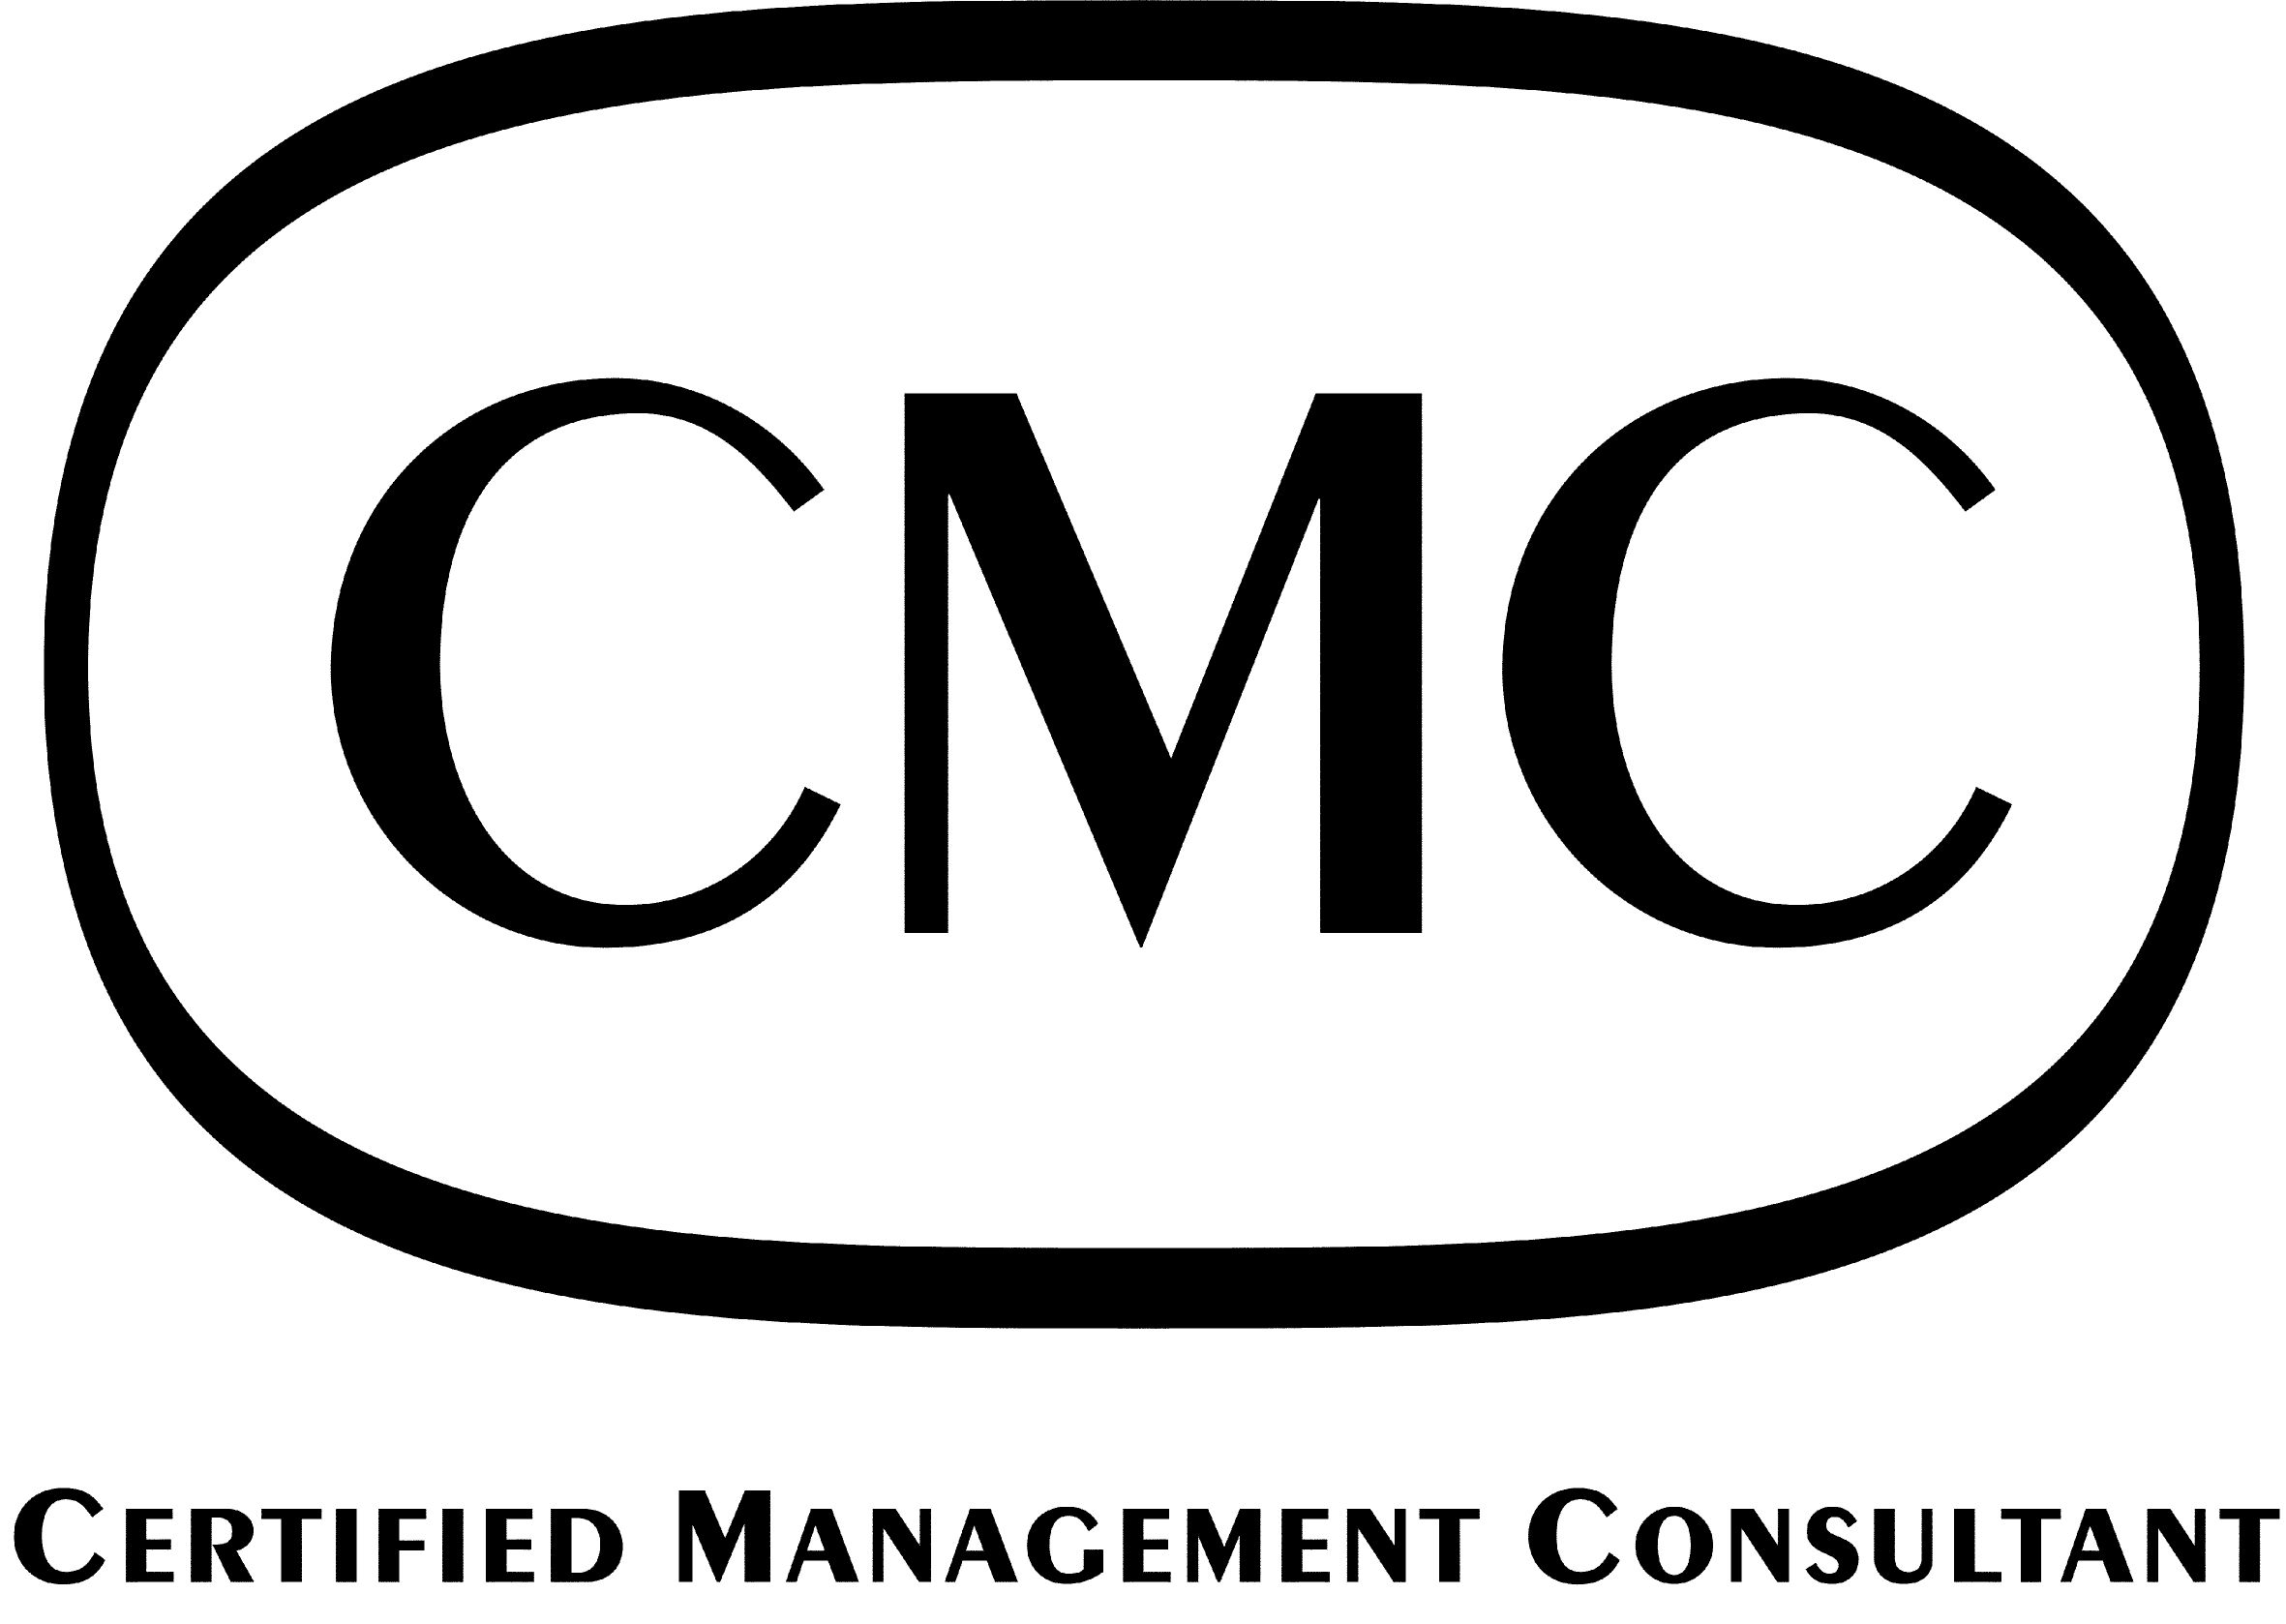 Produktlogo Zertifizierung Certified Management Consultant